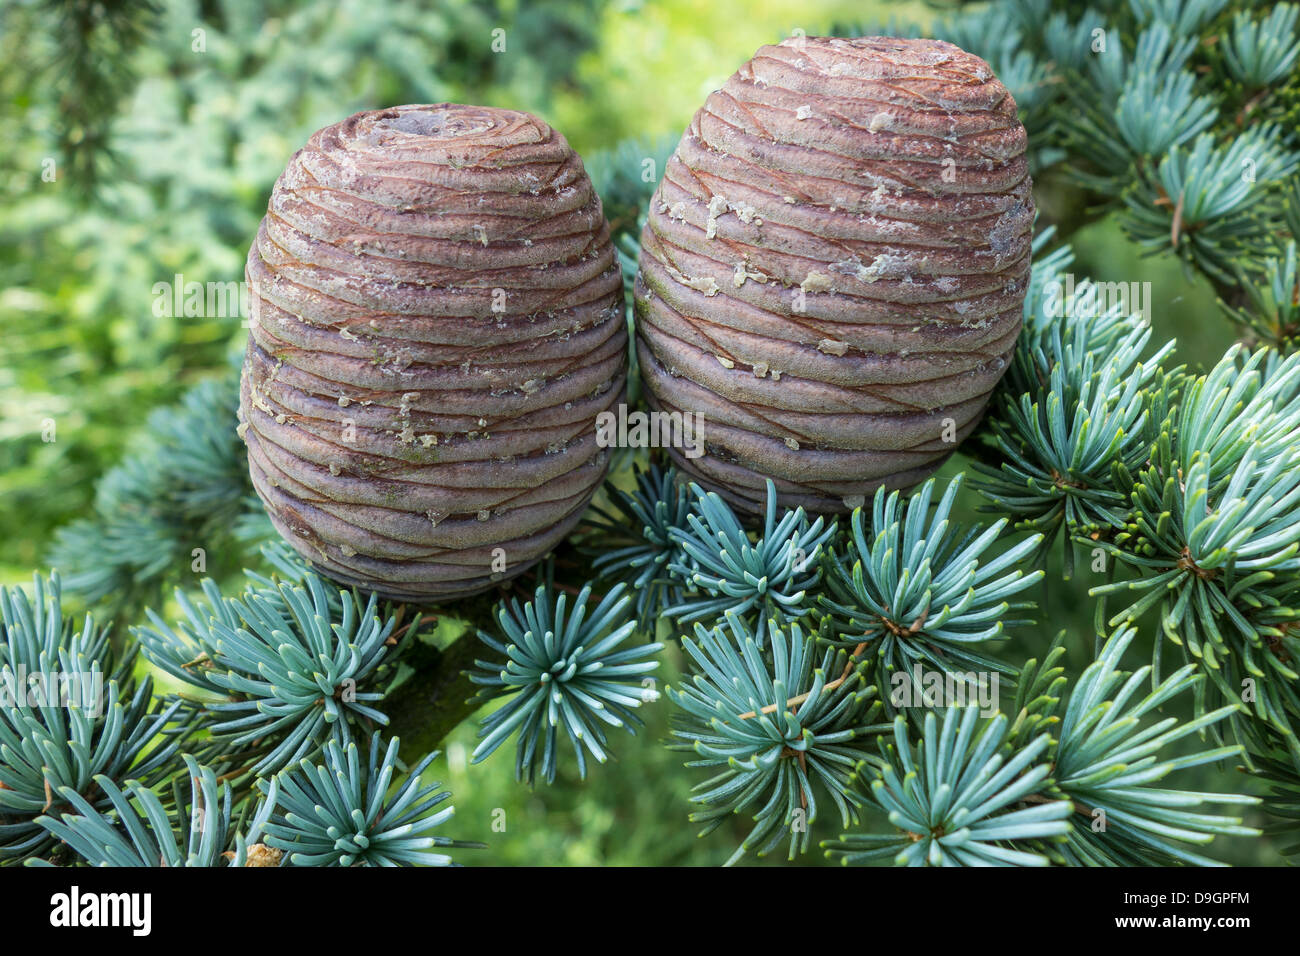 Pine Cones Fir Cones - Stock Image